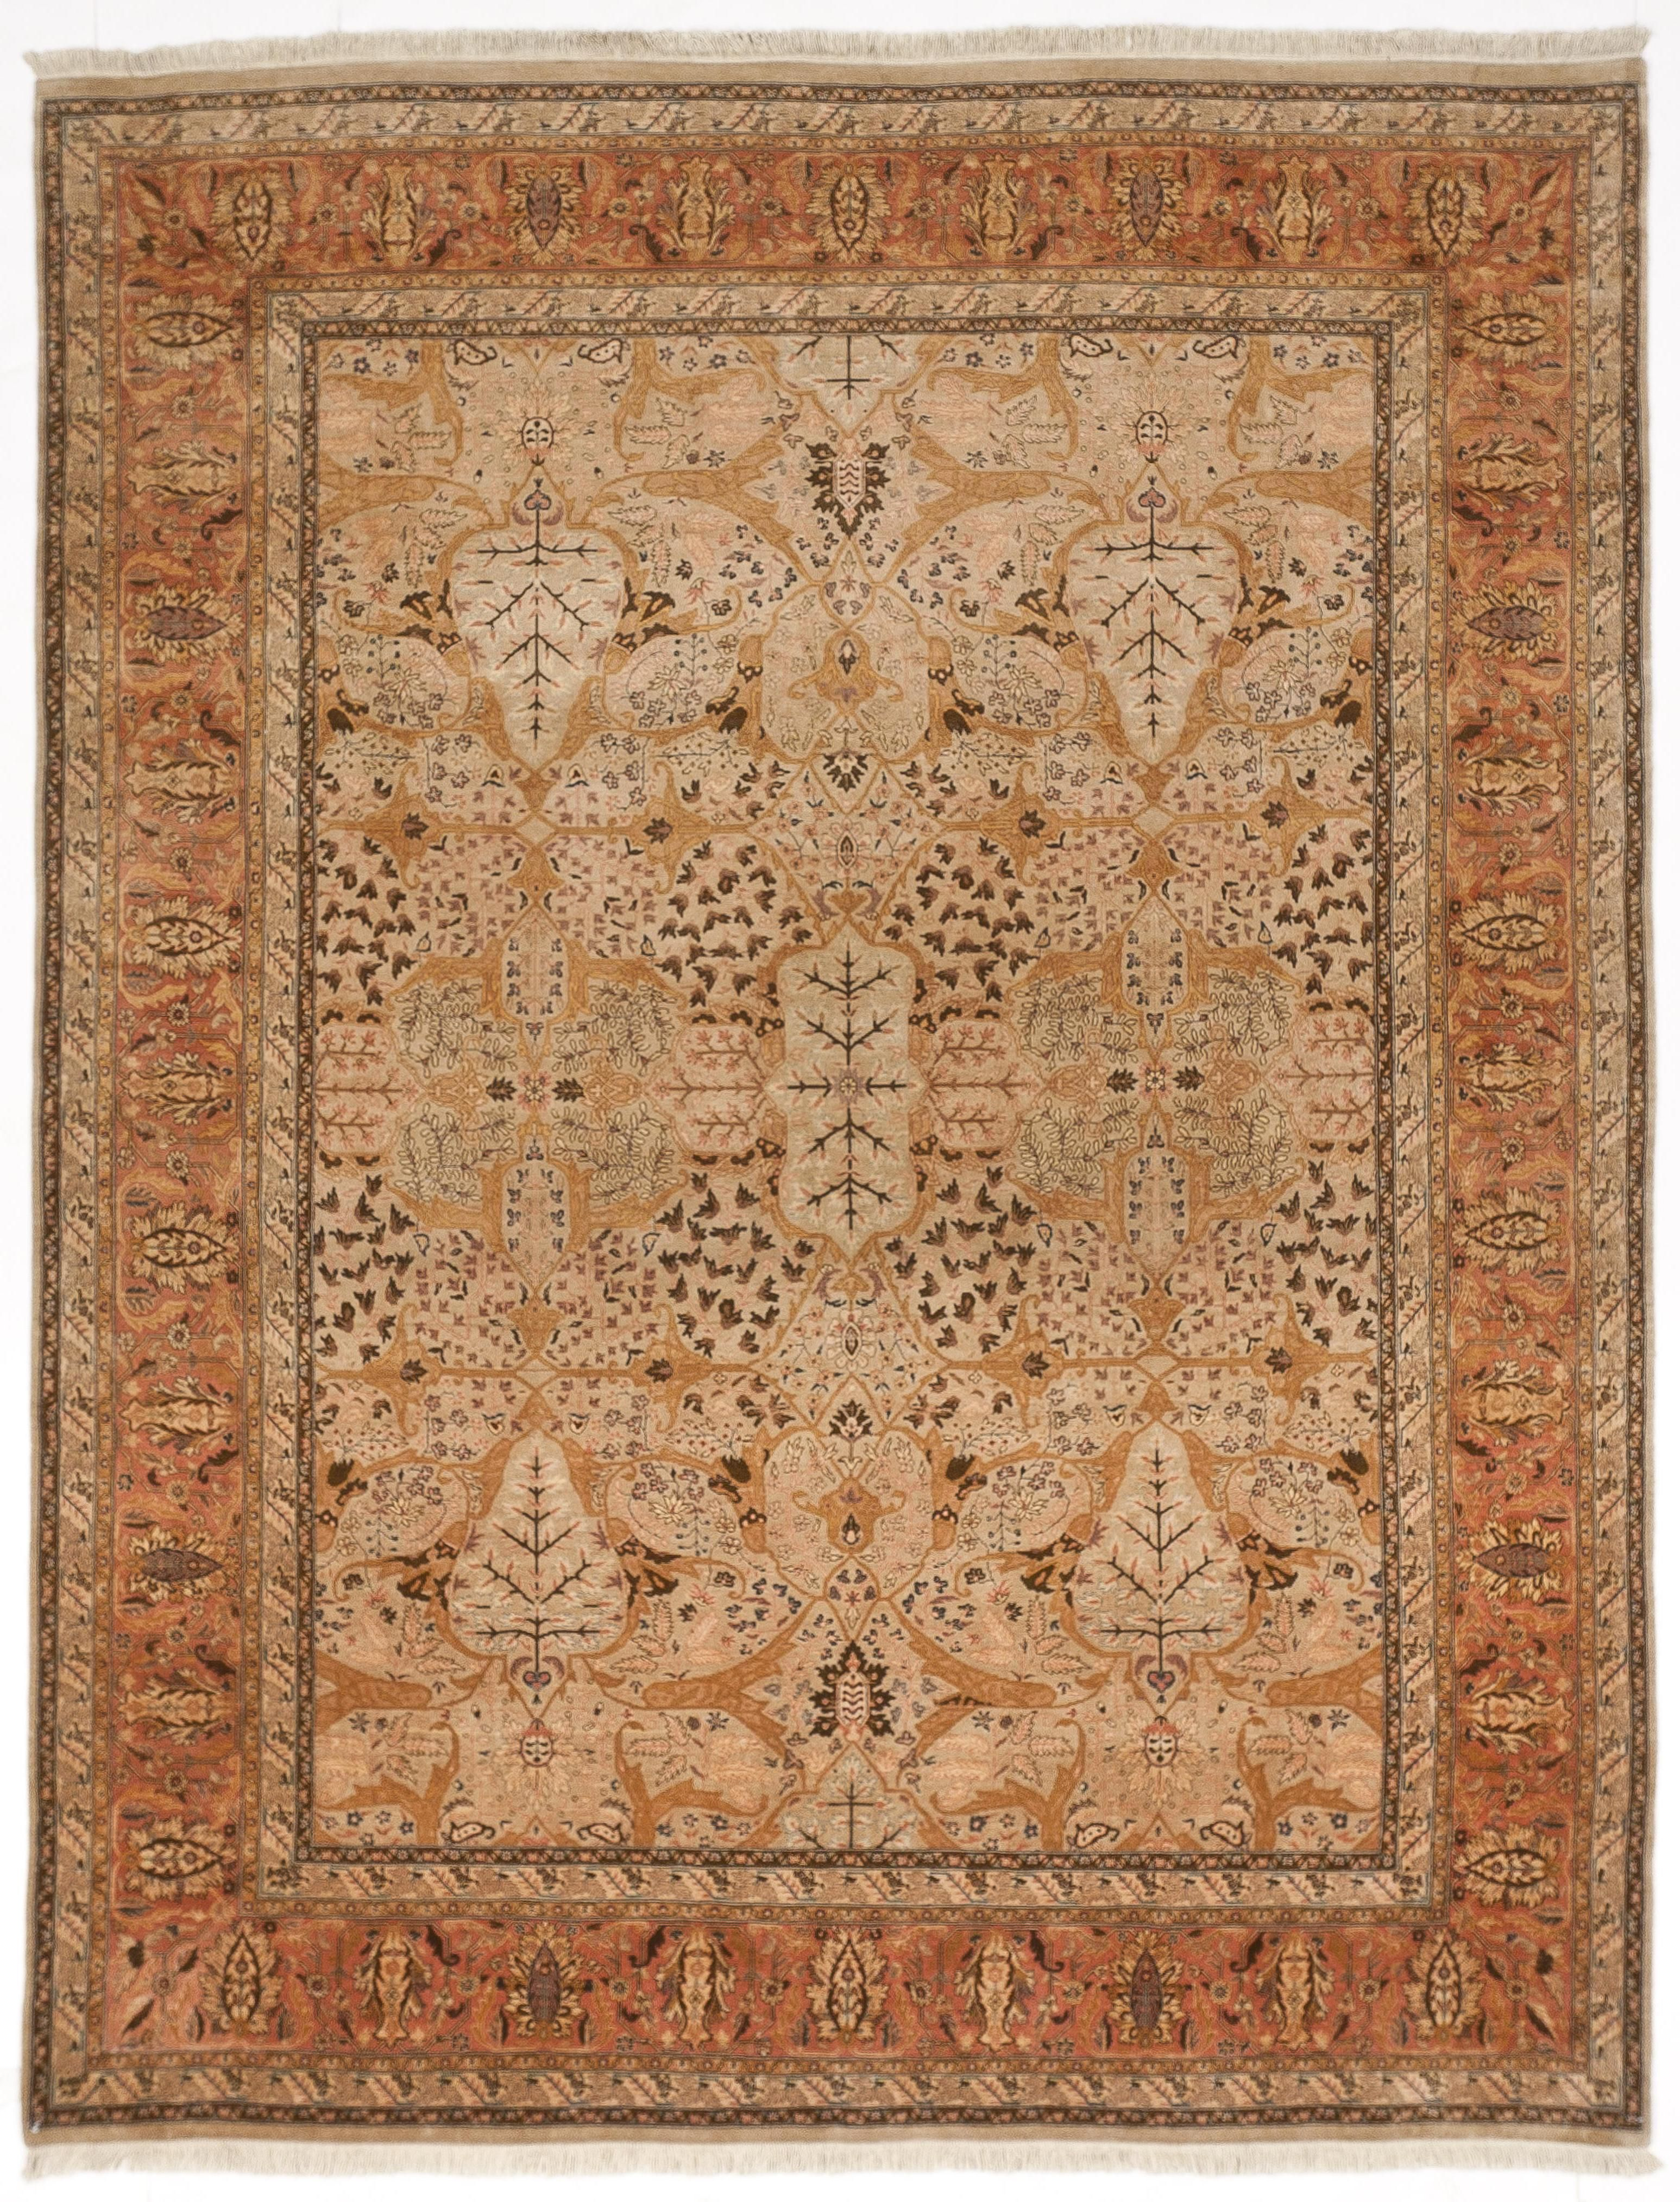 Genuine Hand Knotted Agra Rug From Nasser Luxury Rug Indian Rugs Rugs On Carpet Dark Carpet